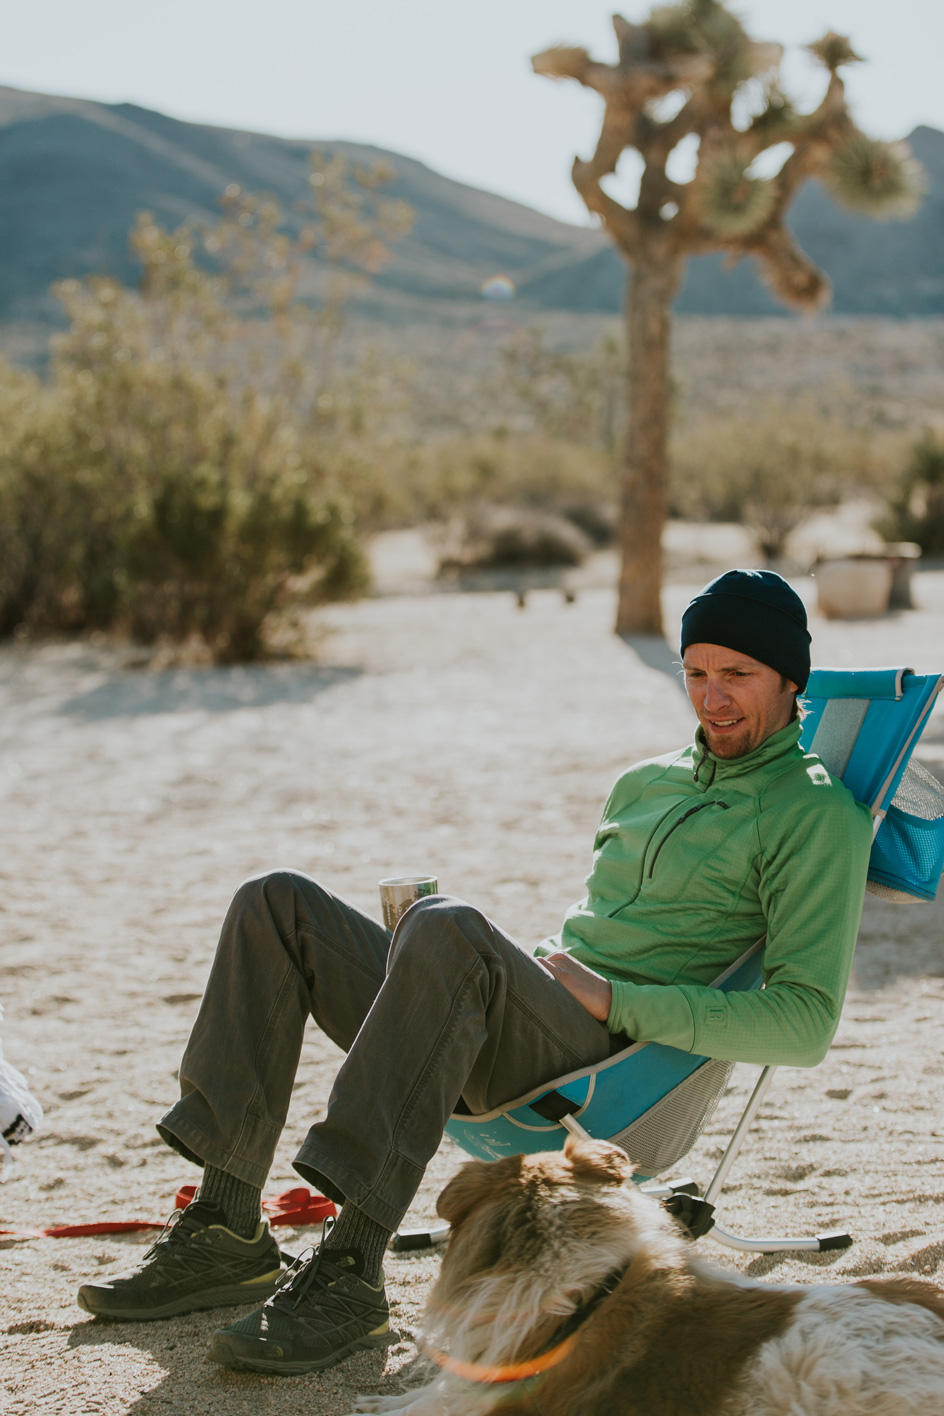 CindyGiovagnoli_Joshua_Tree_National_Park_California_Mojave_Desert_Cholla_Garden_Hidden_Valley_climbing_hiking_camping-034.jpg